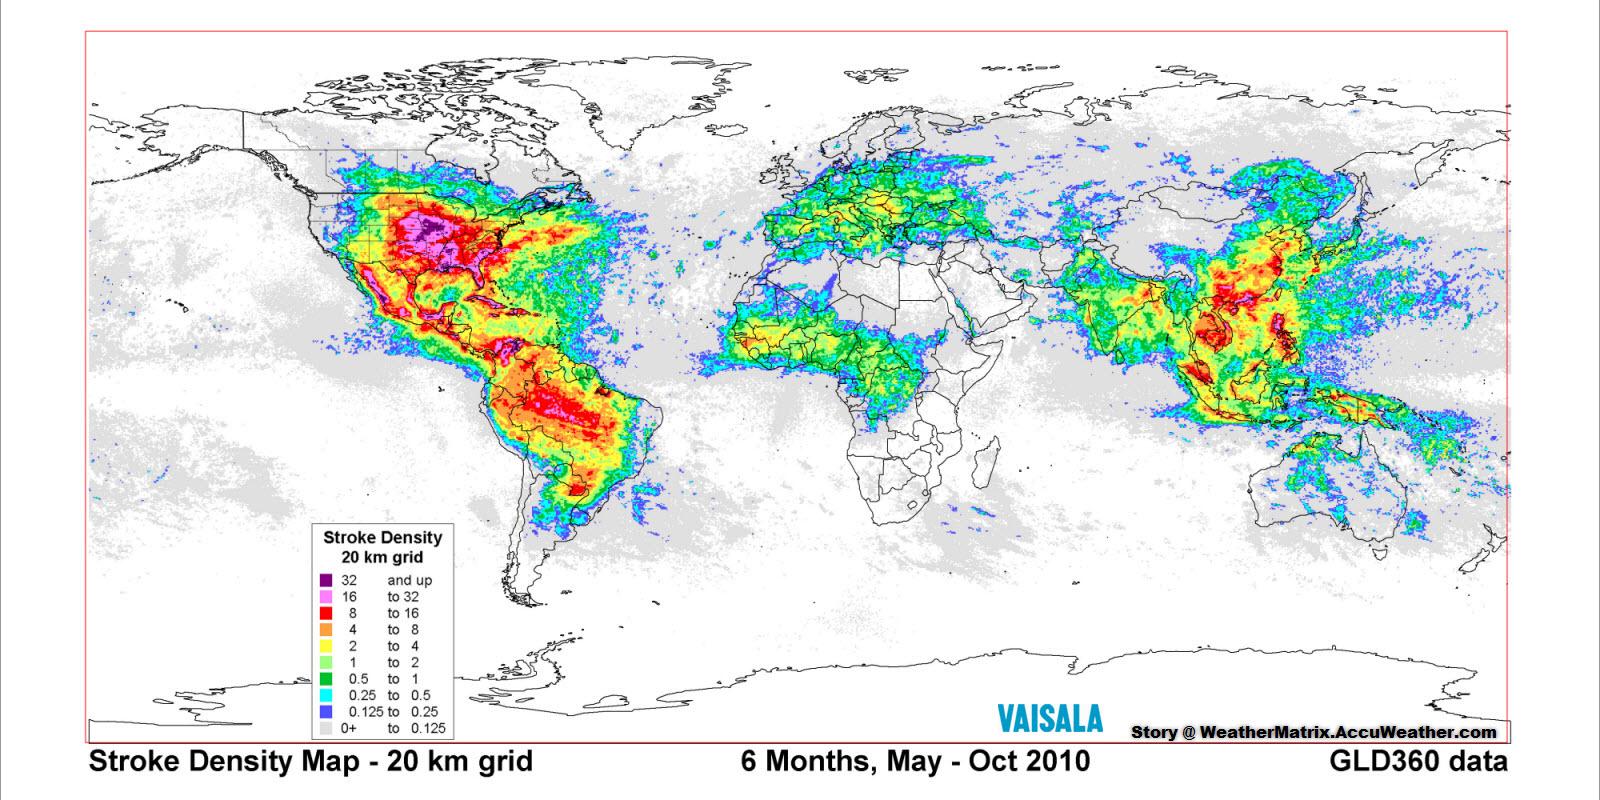 тематична карта ,удари блискавок, земна поверхня, географія